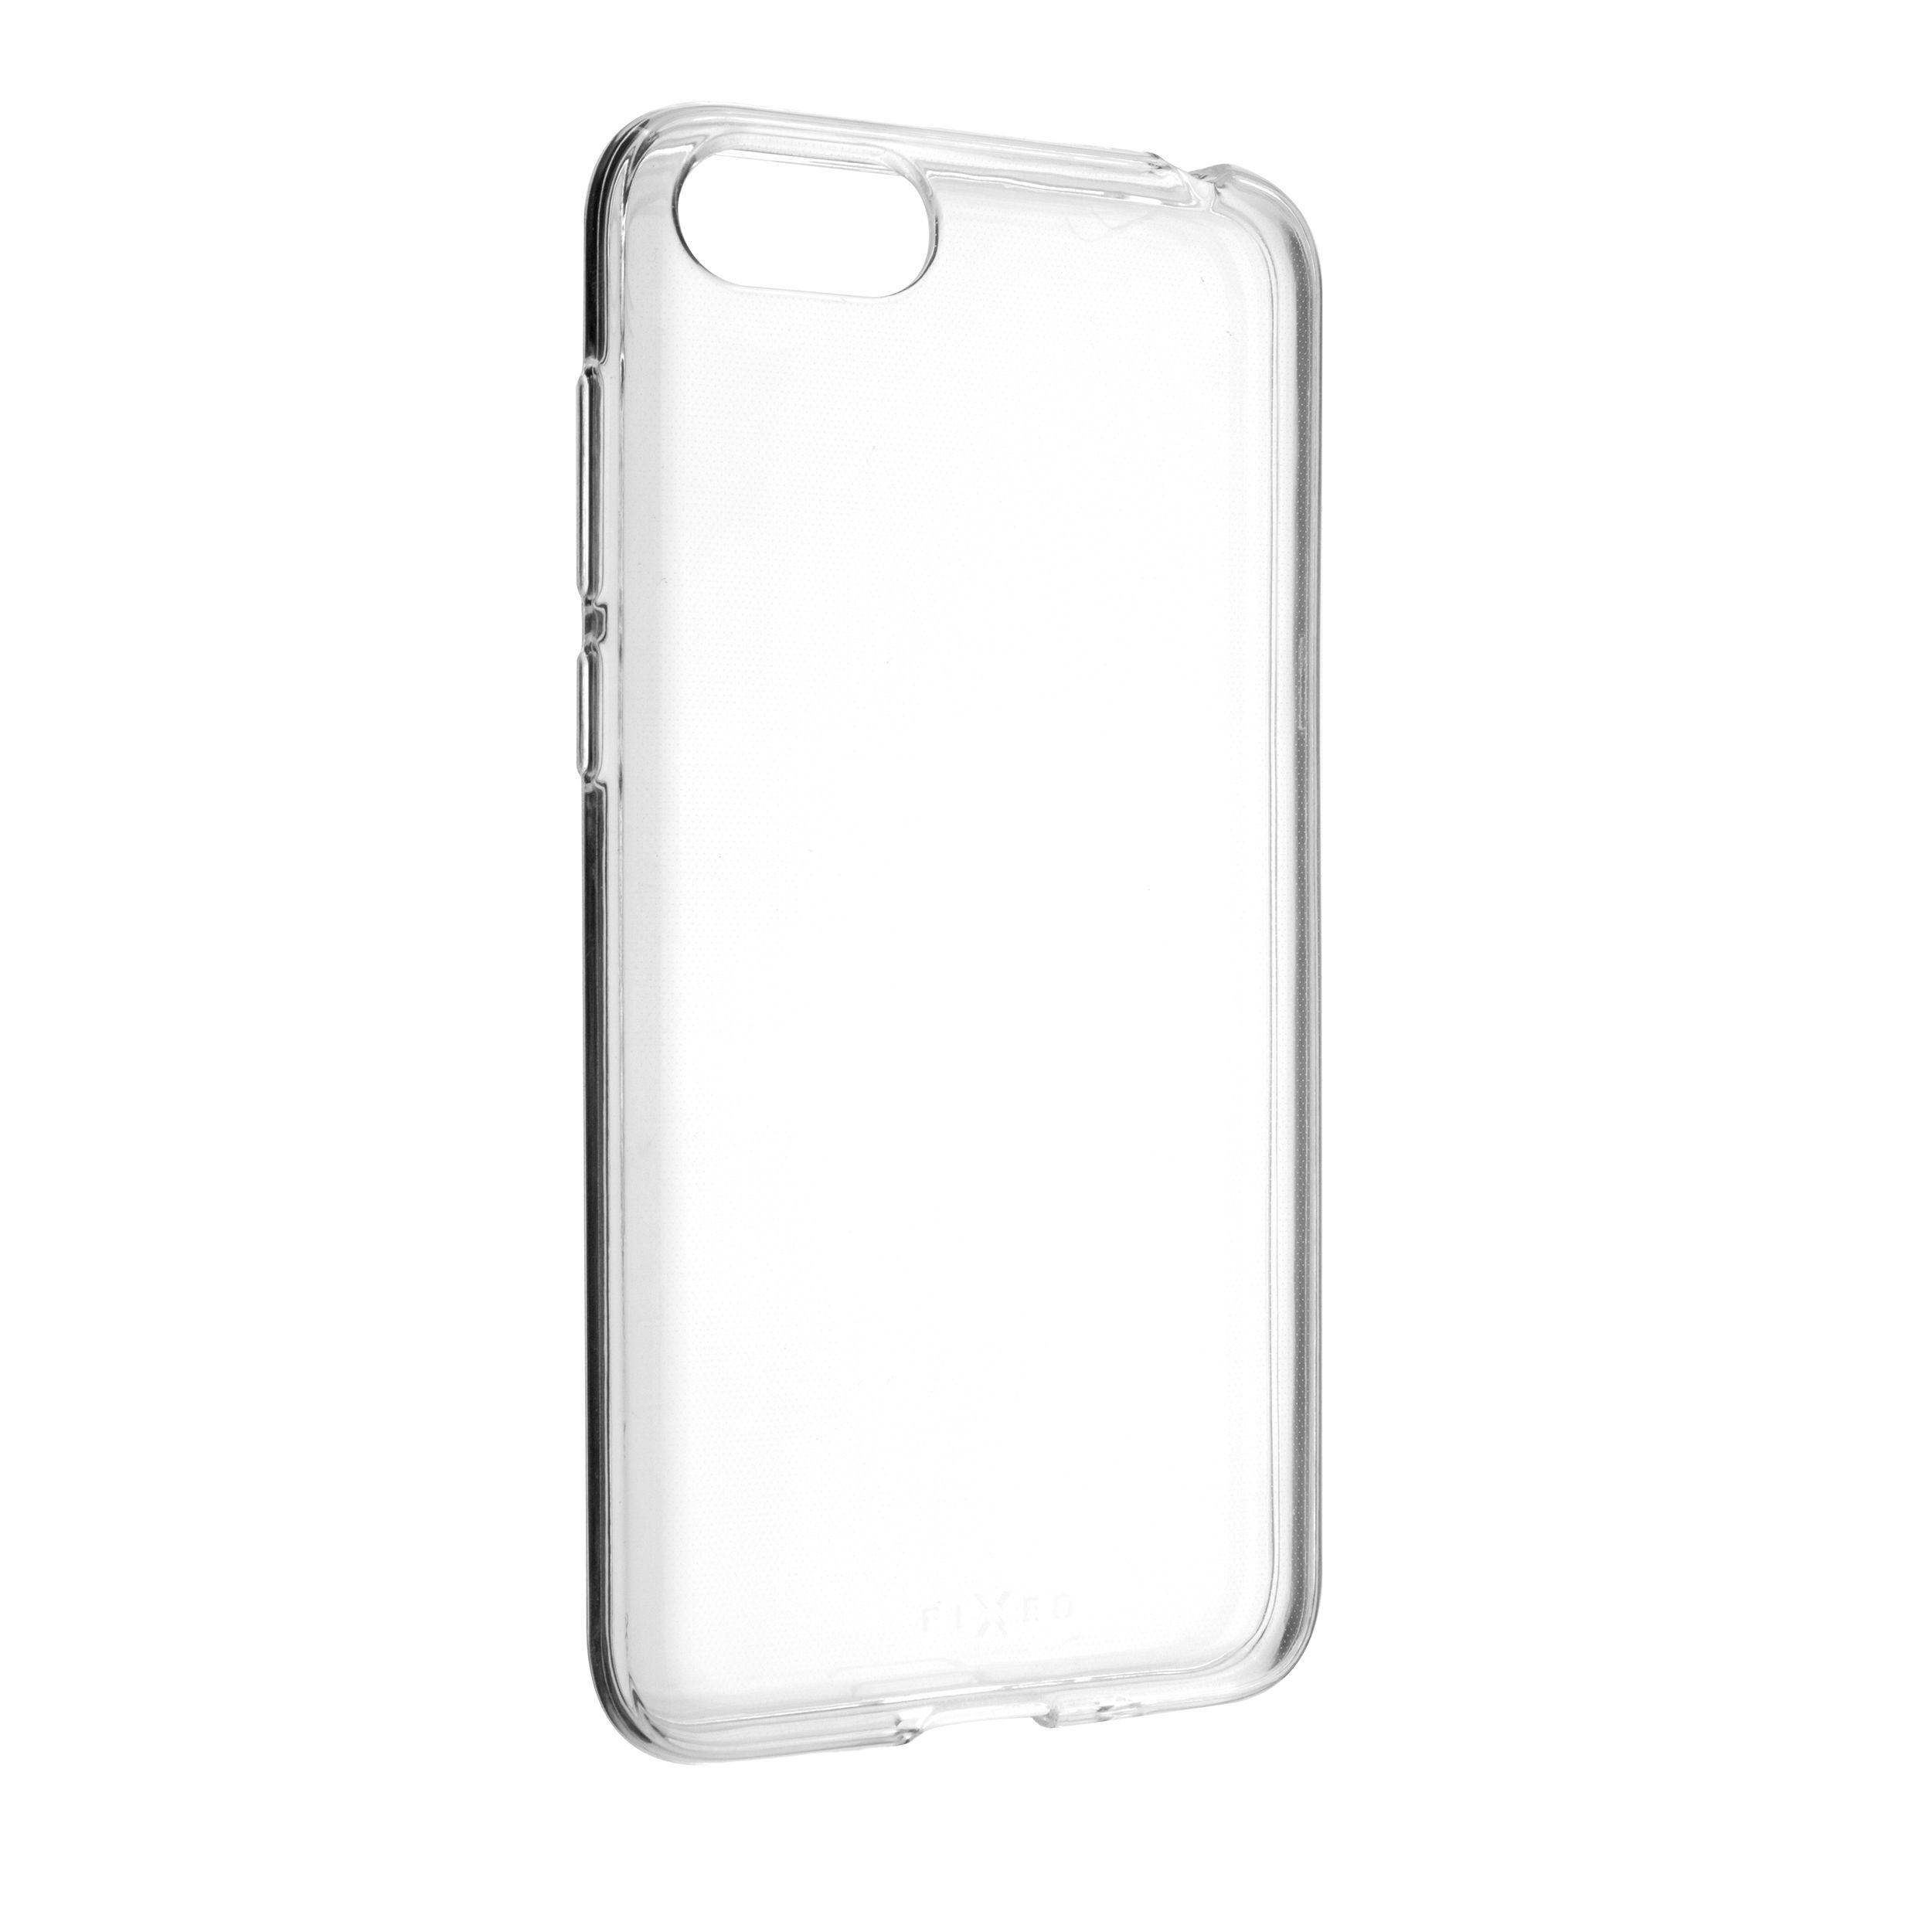 TPU gelové pouzdro FIXED pro Huawei Y5 (2018), čiré